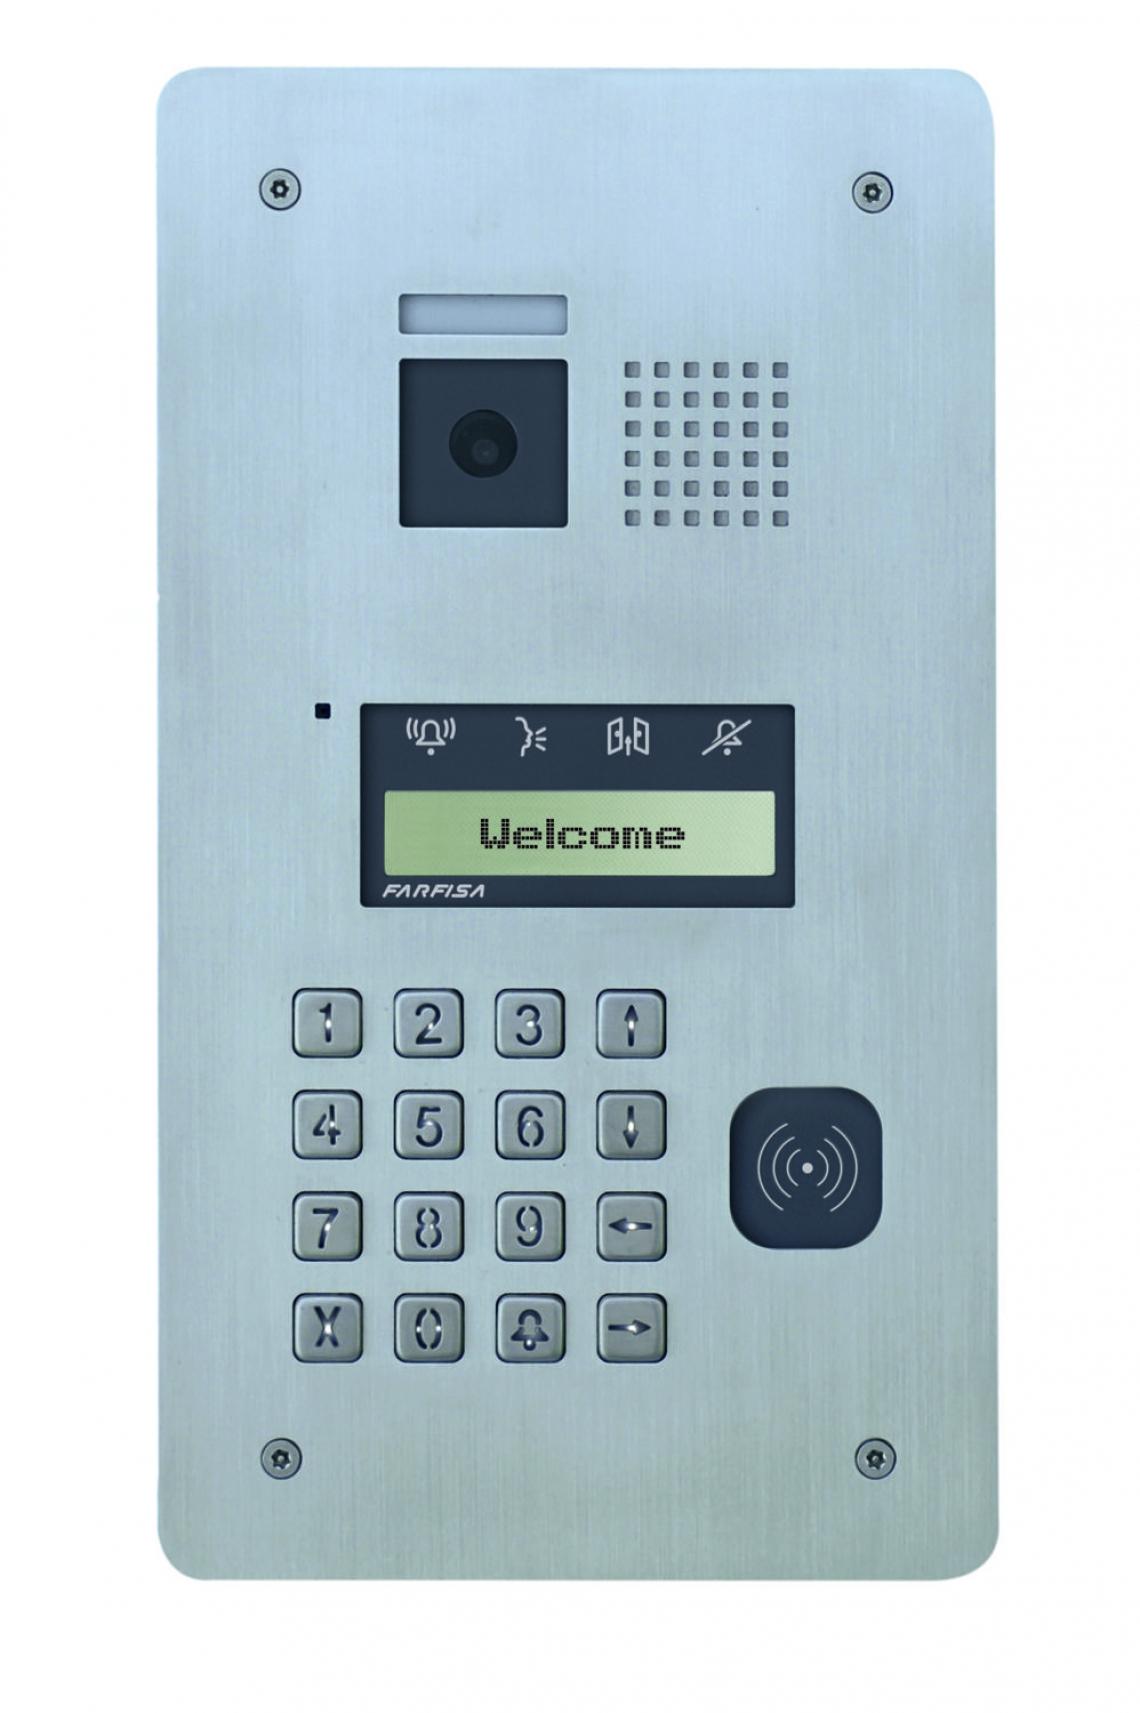 POSTO ESTERNO SOLVO RFID - TD2000R